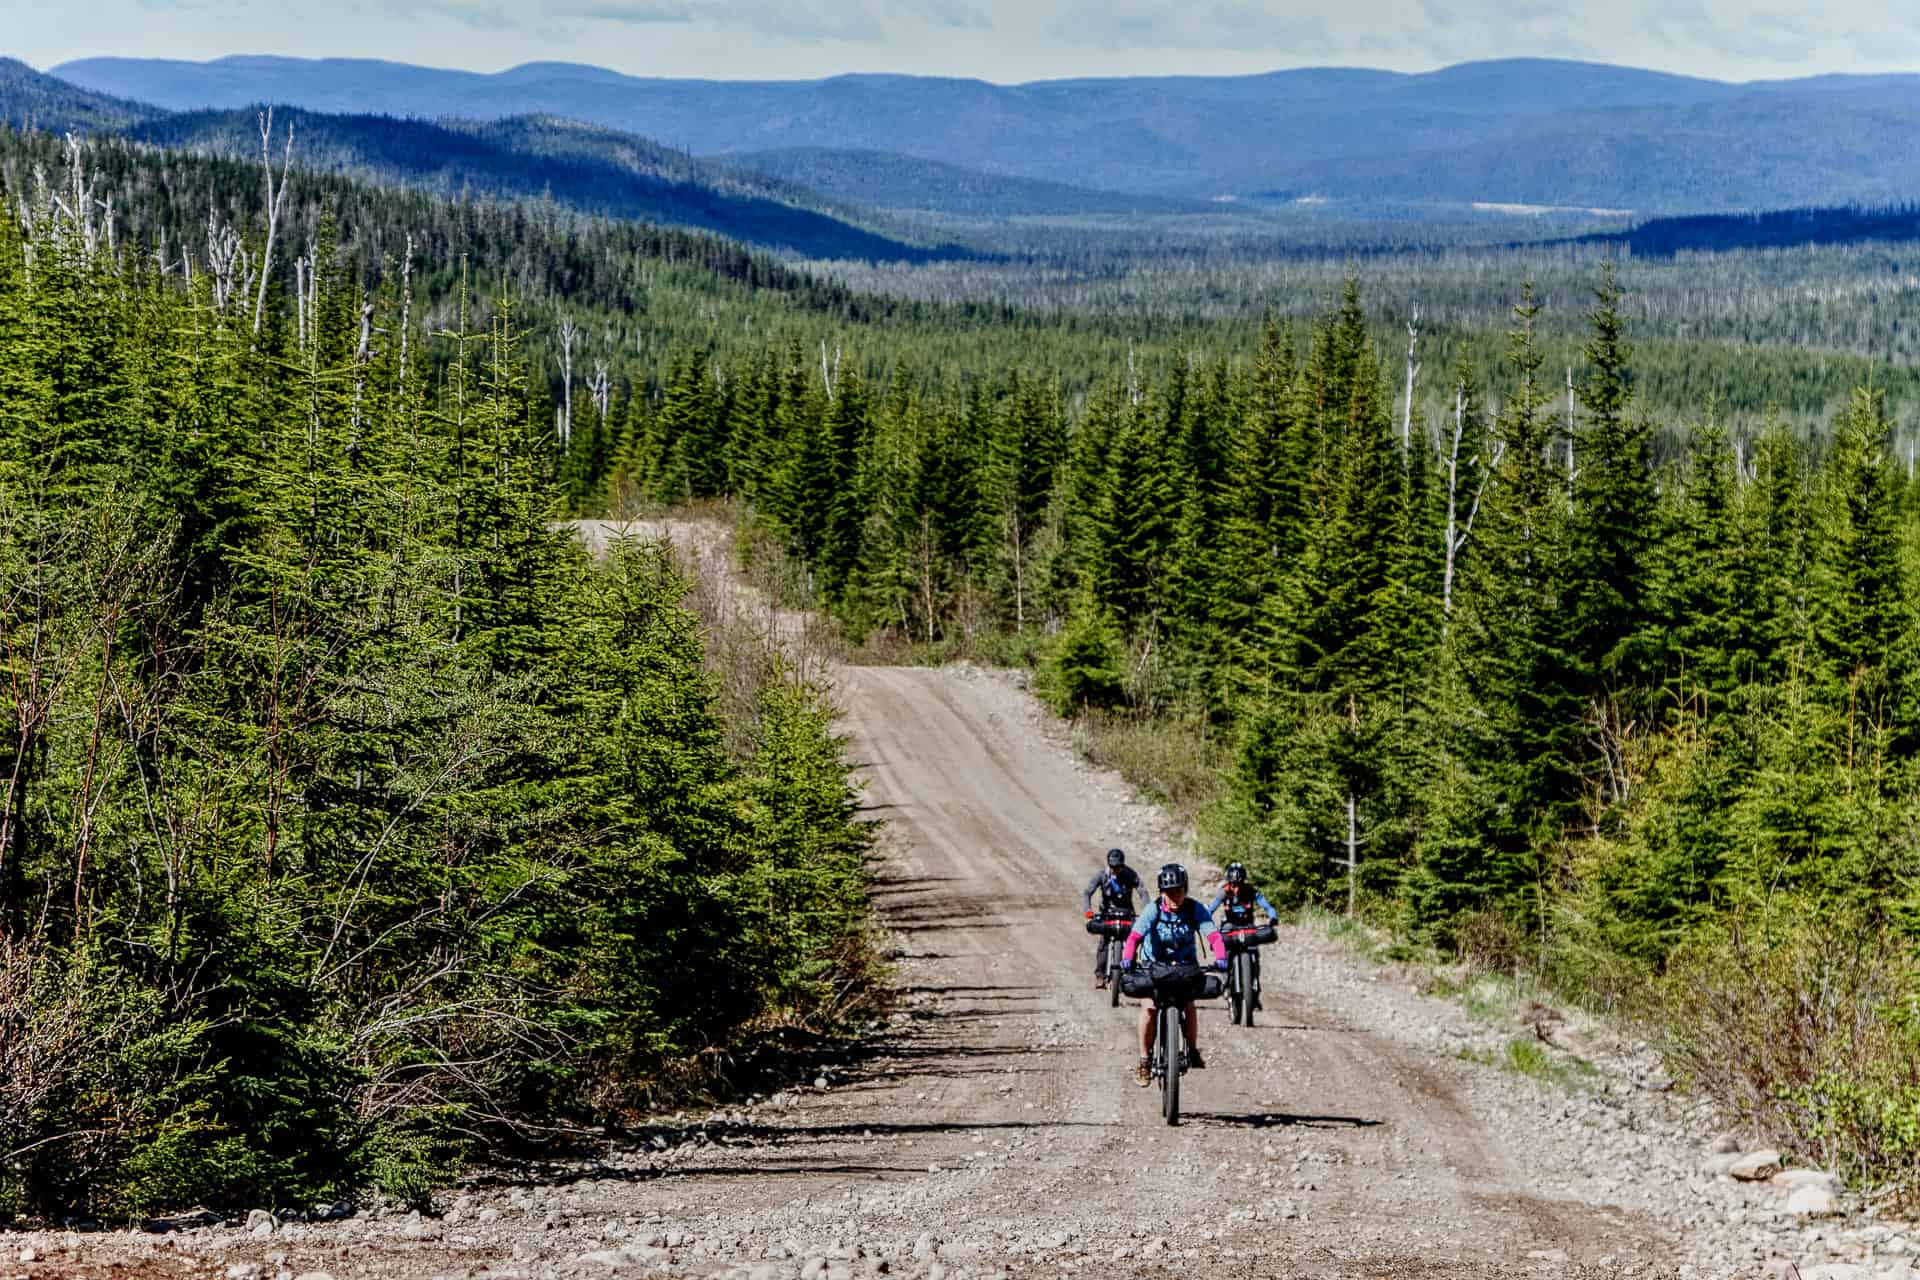 bikepacking-riviere-cyriac-laurentides